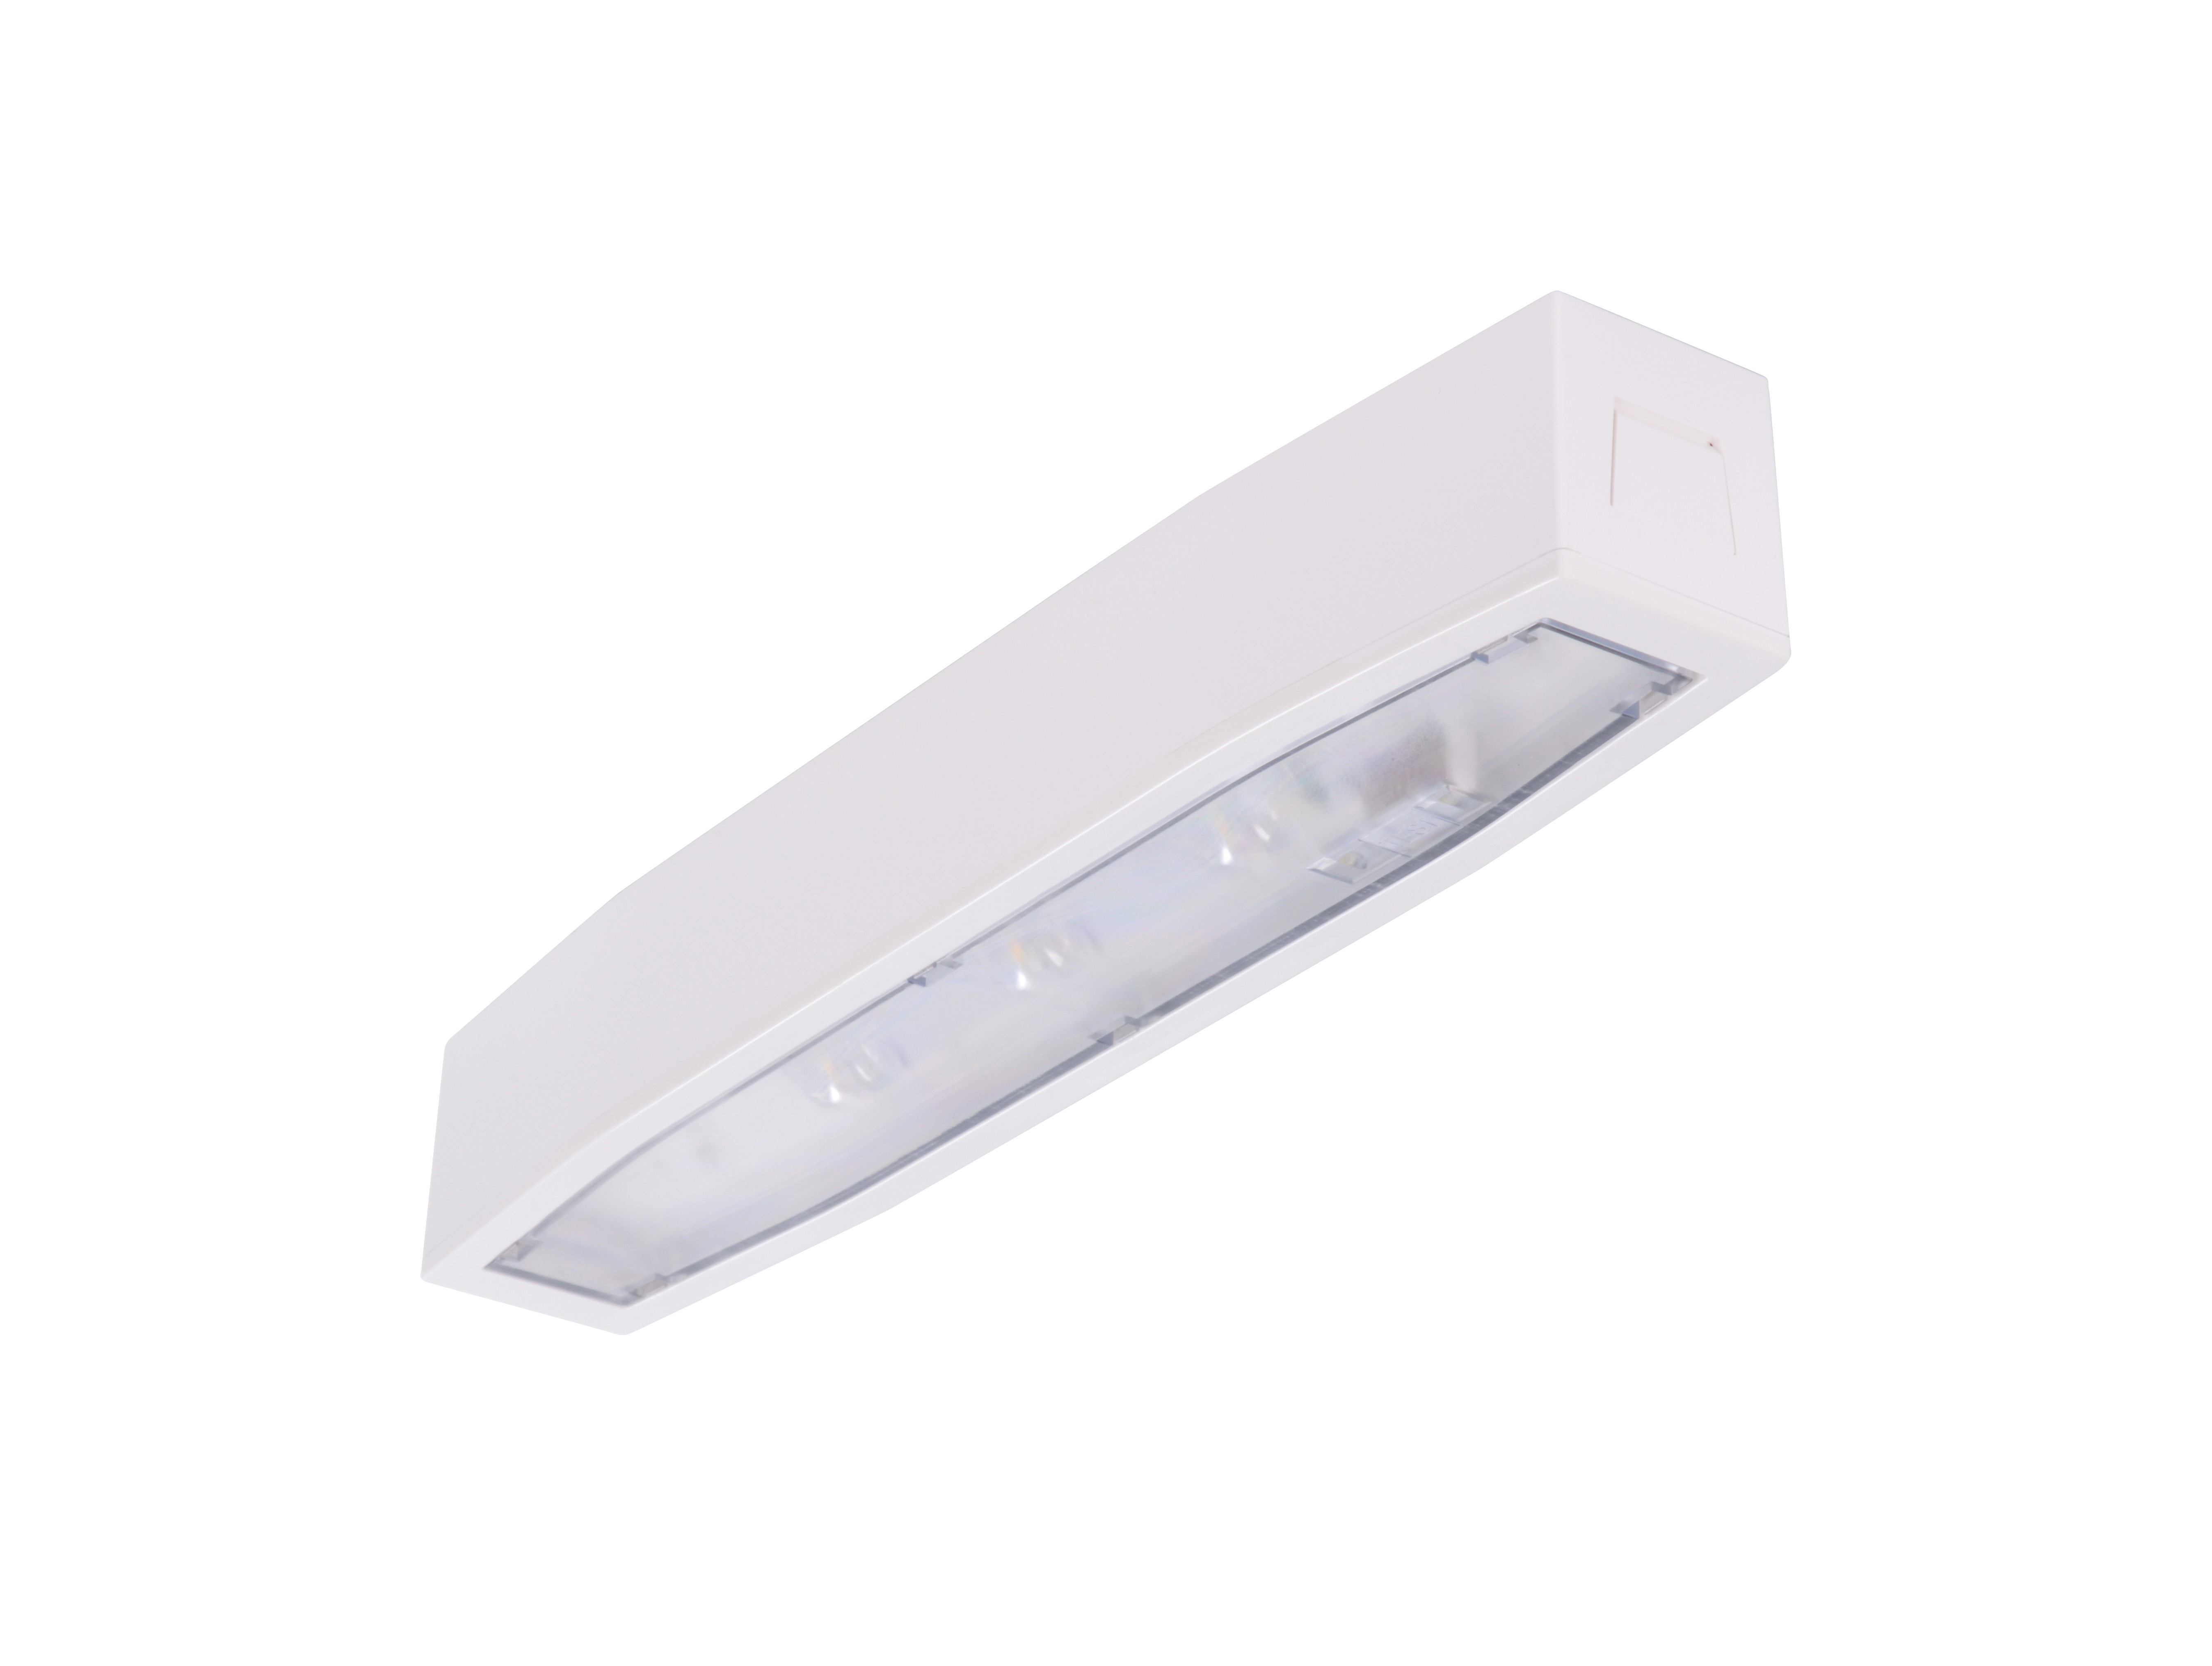 Lampa antipanica led Intelight 94771   2h nementinut test automat 0